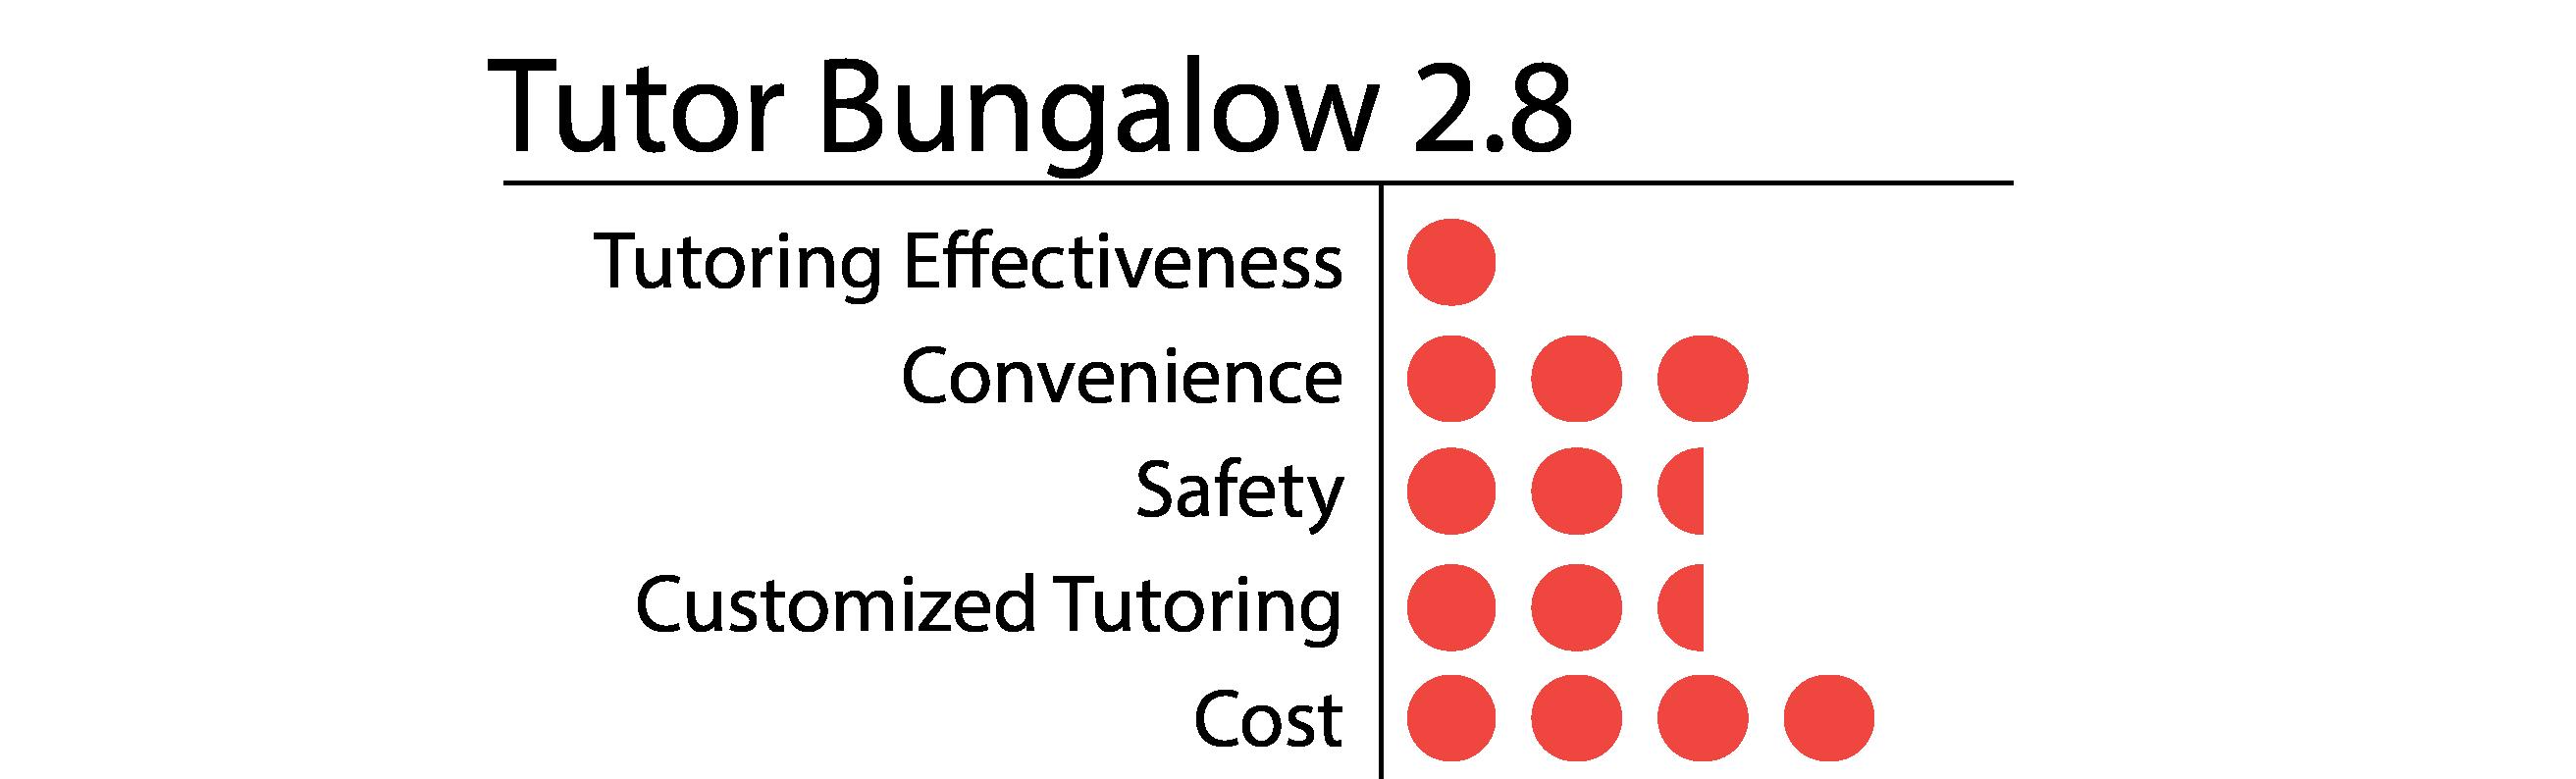 Tutor Bungalow-01